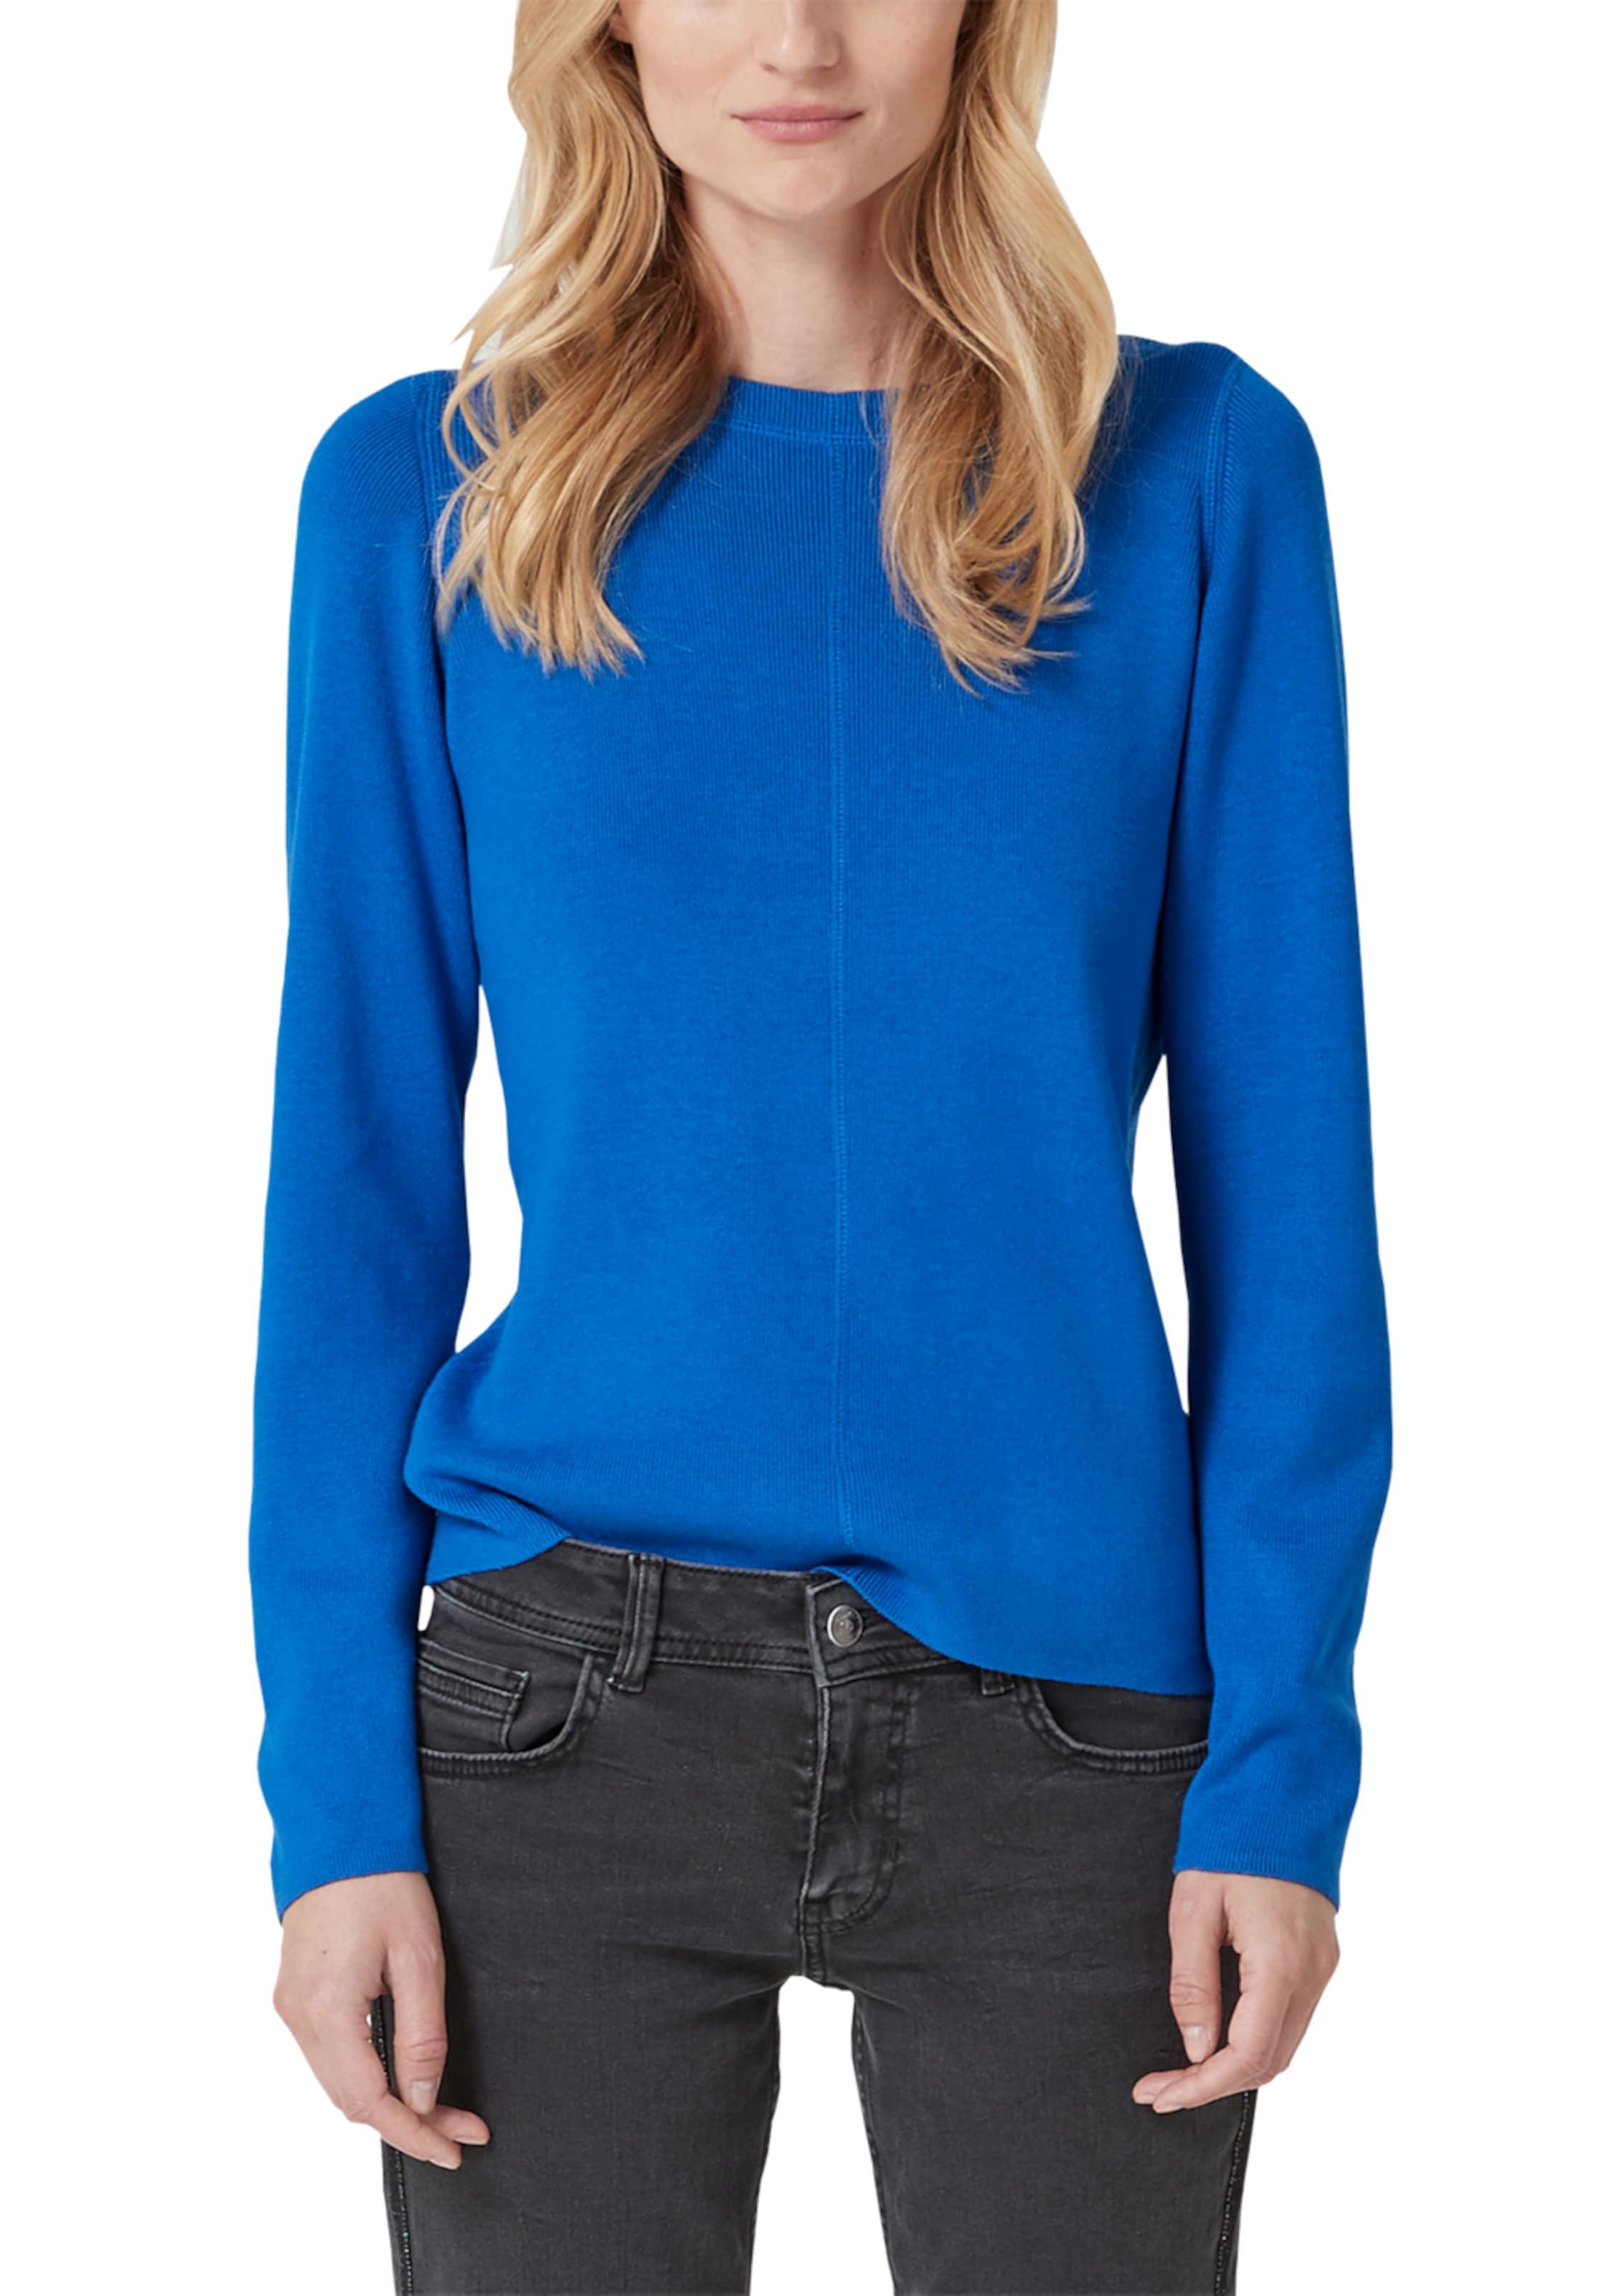 Red Label Pullover In S oliver Blau cjL5RA34q